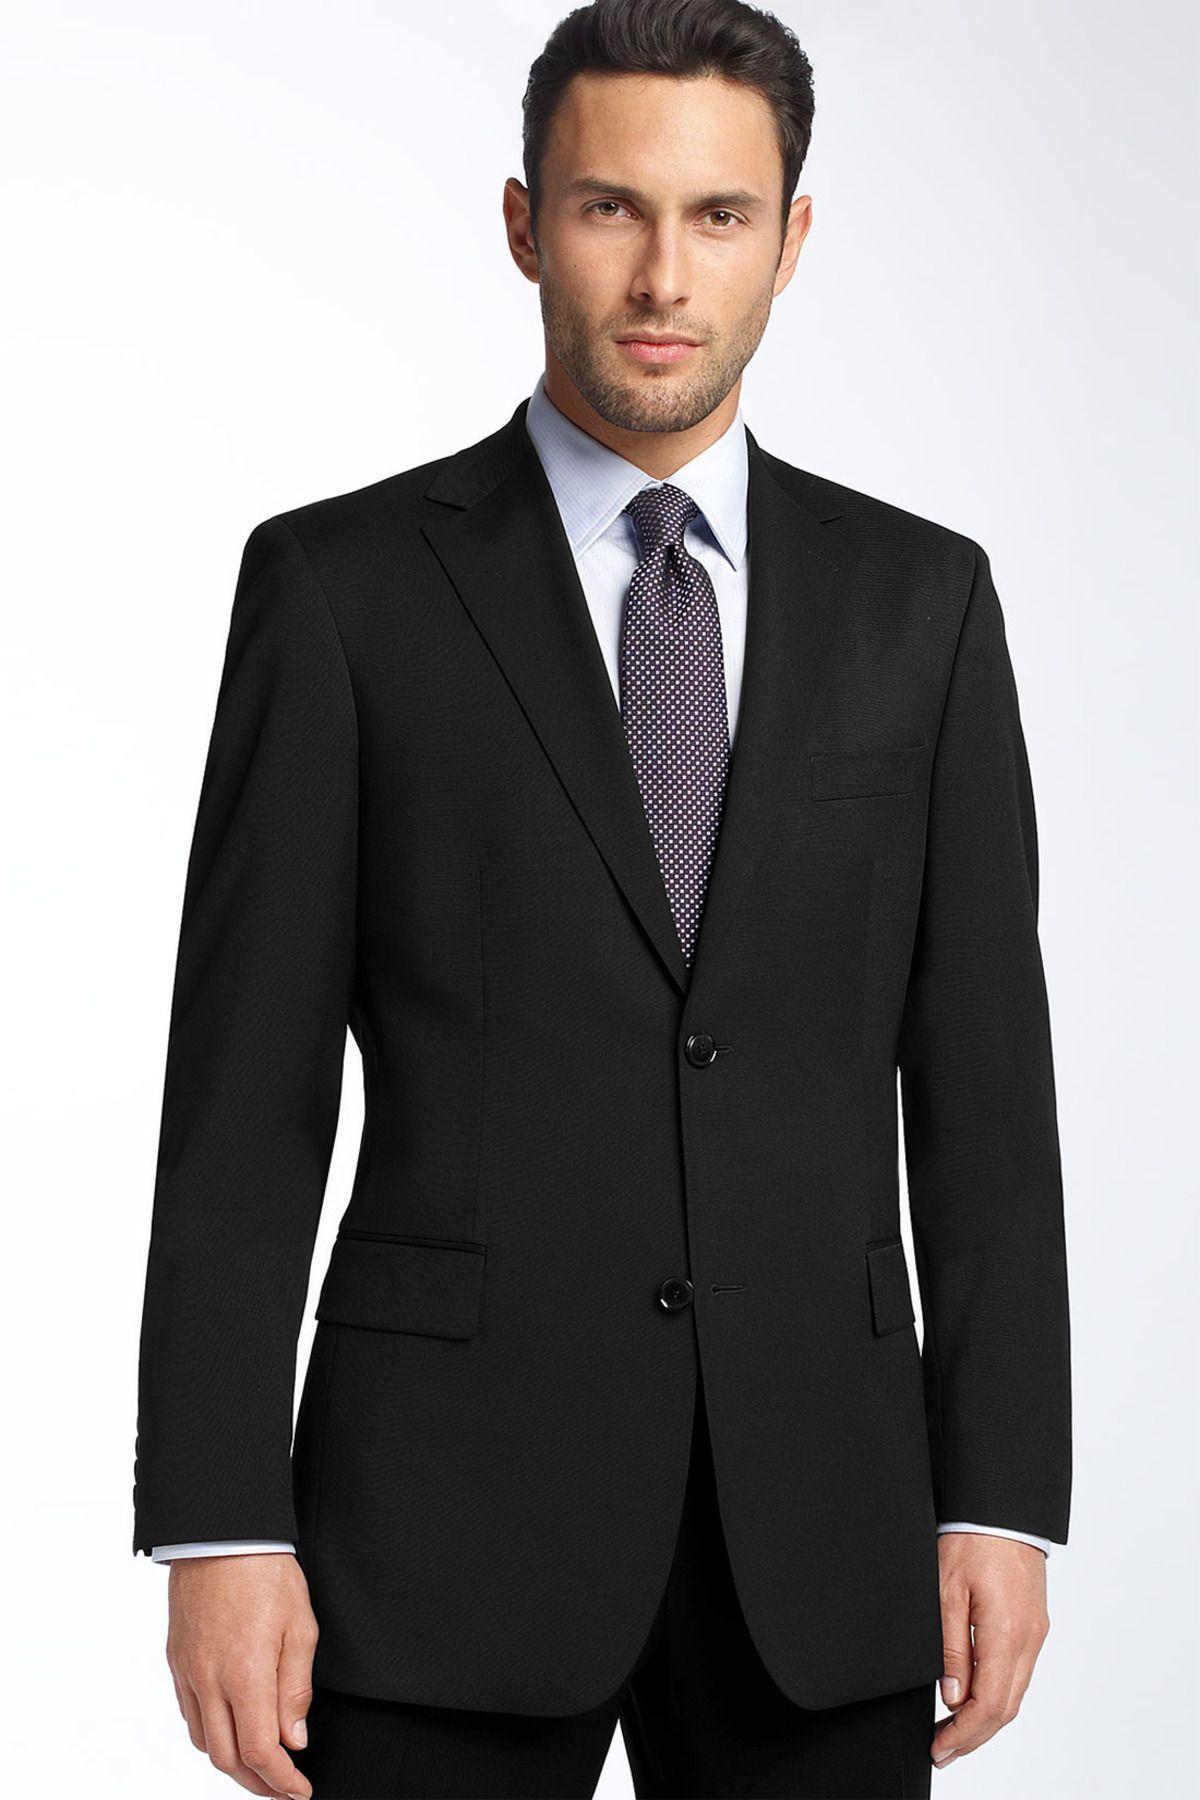 BOSS | BOSS HUGO BOSS 'Pasolini' Black Virgin Wool Sportcoat | Nordstrom  Rack